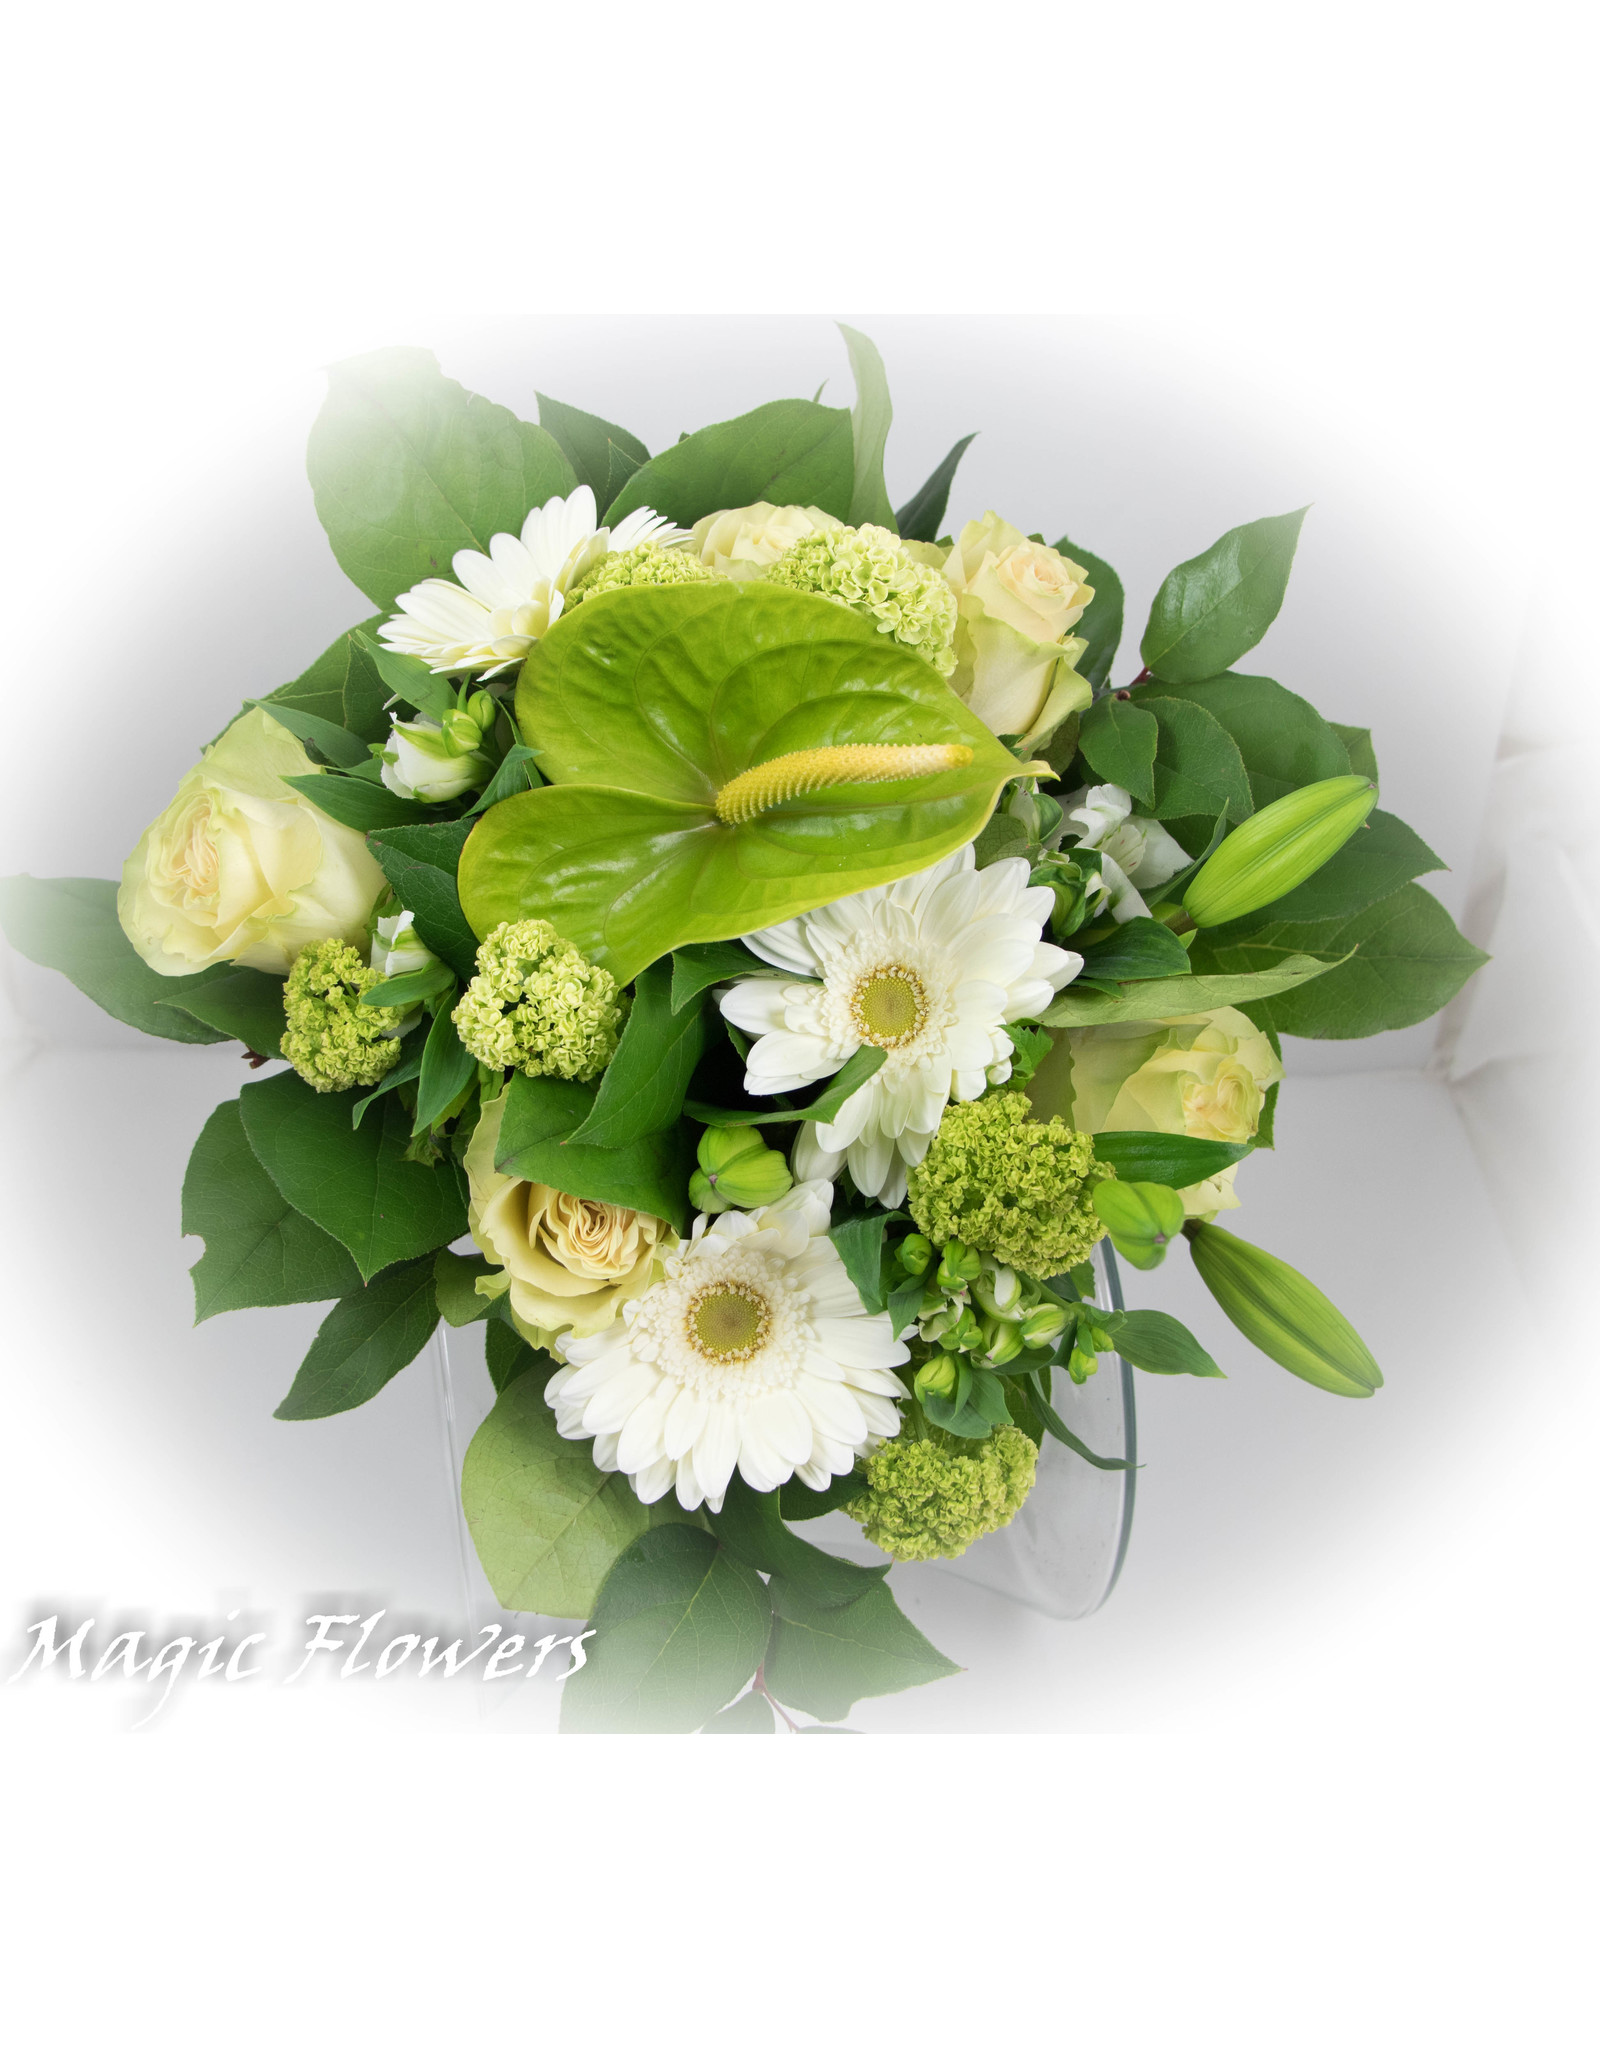 Magic Flowers Boeket Wit - Groen Medium